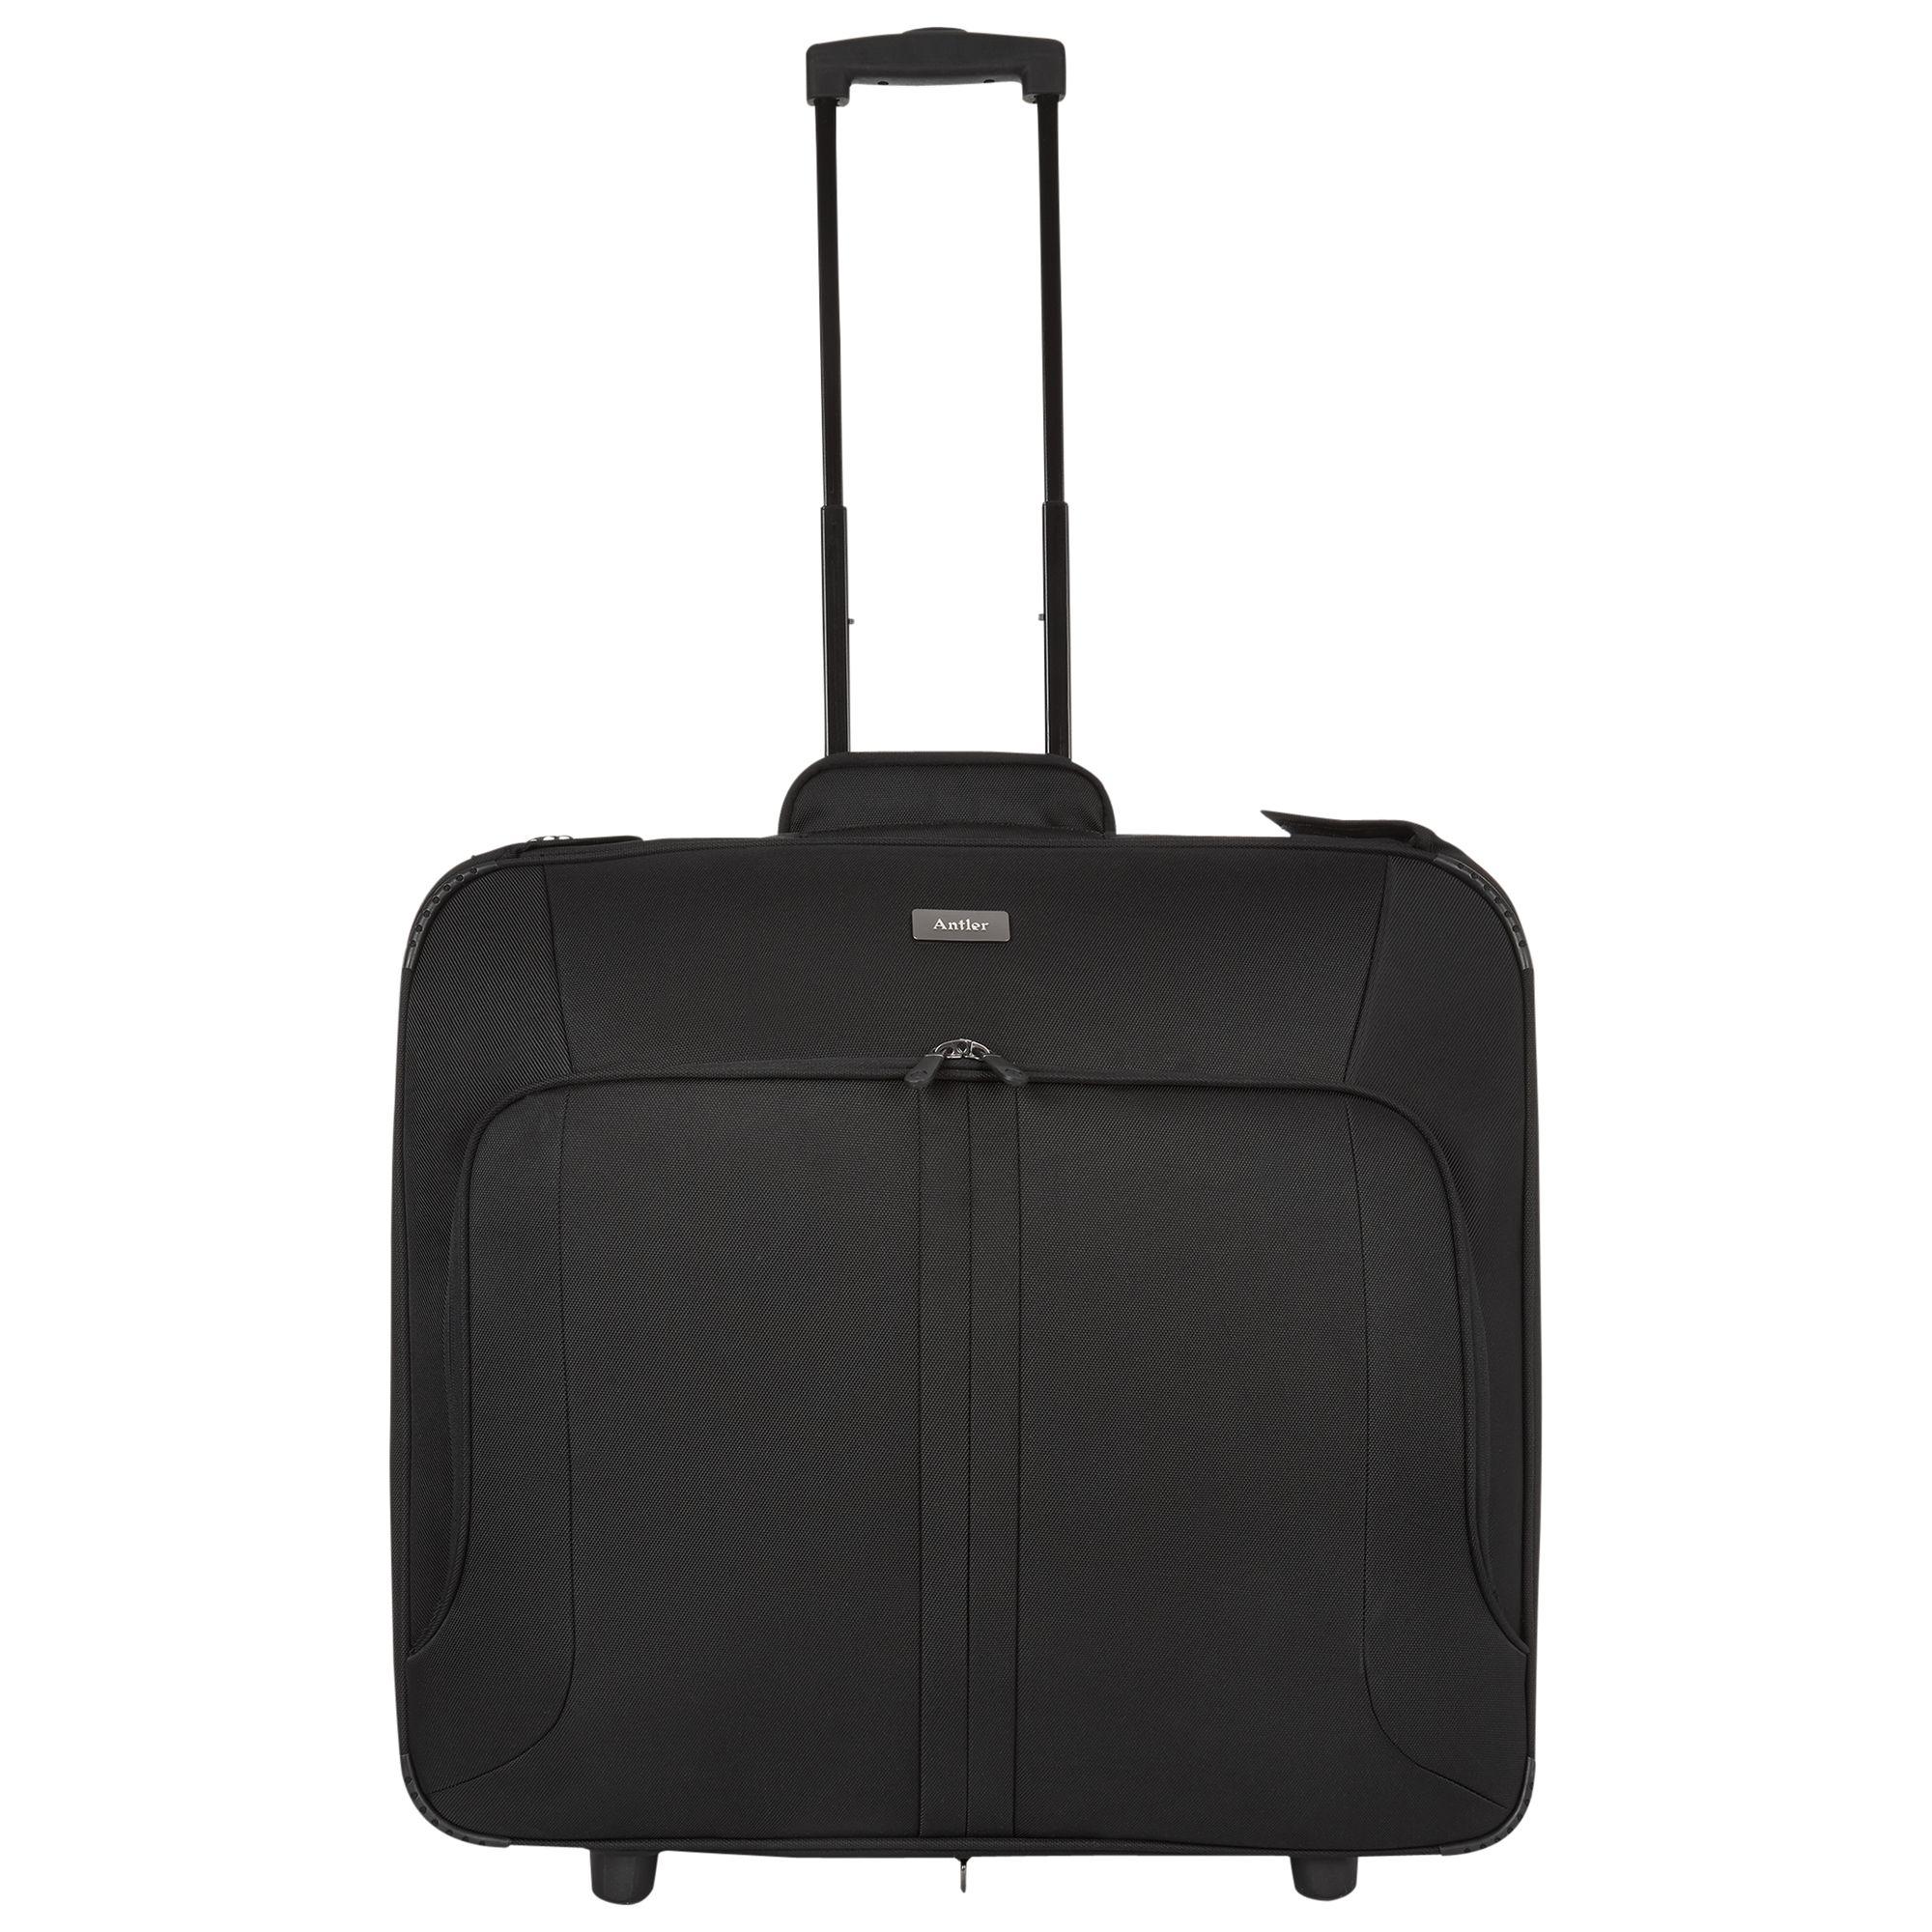 Antler Antler Business 200 Garment Carrier, Black